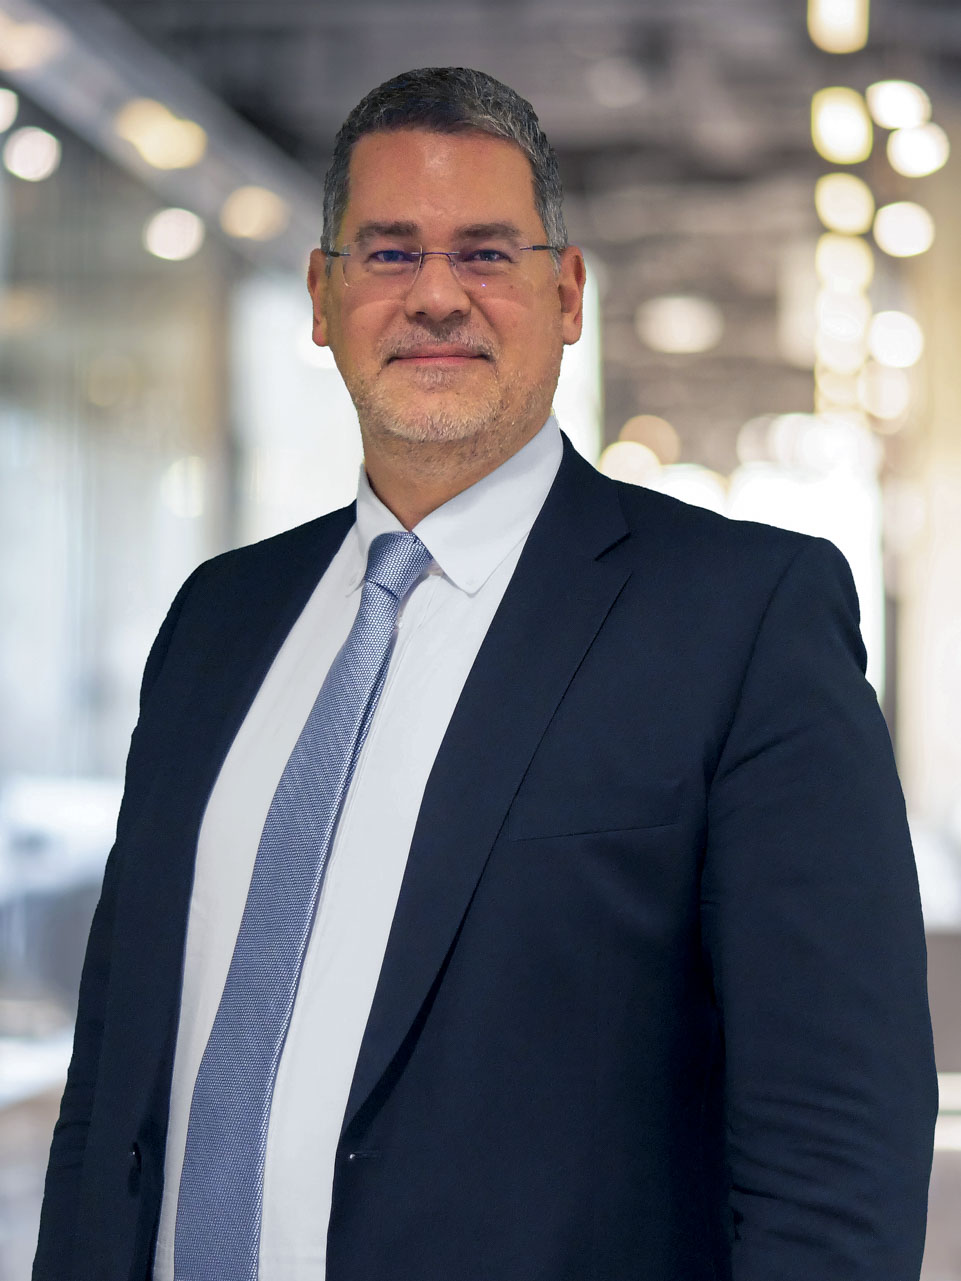 Salzburger Notariatskammer: Notar Mag. Stephan Moser